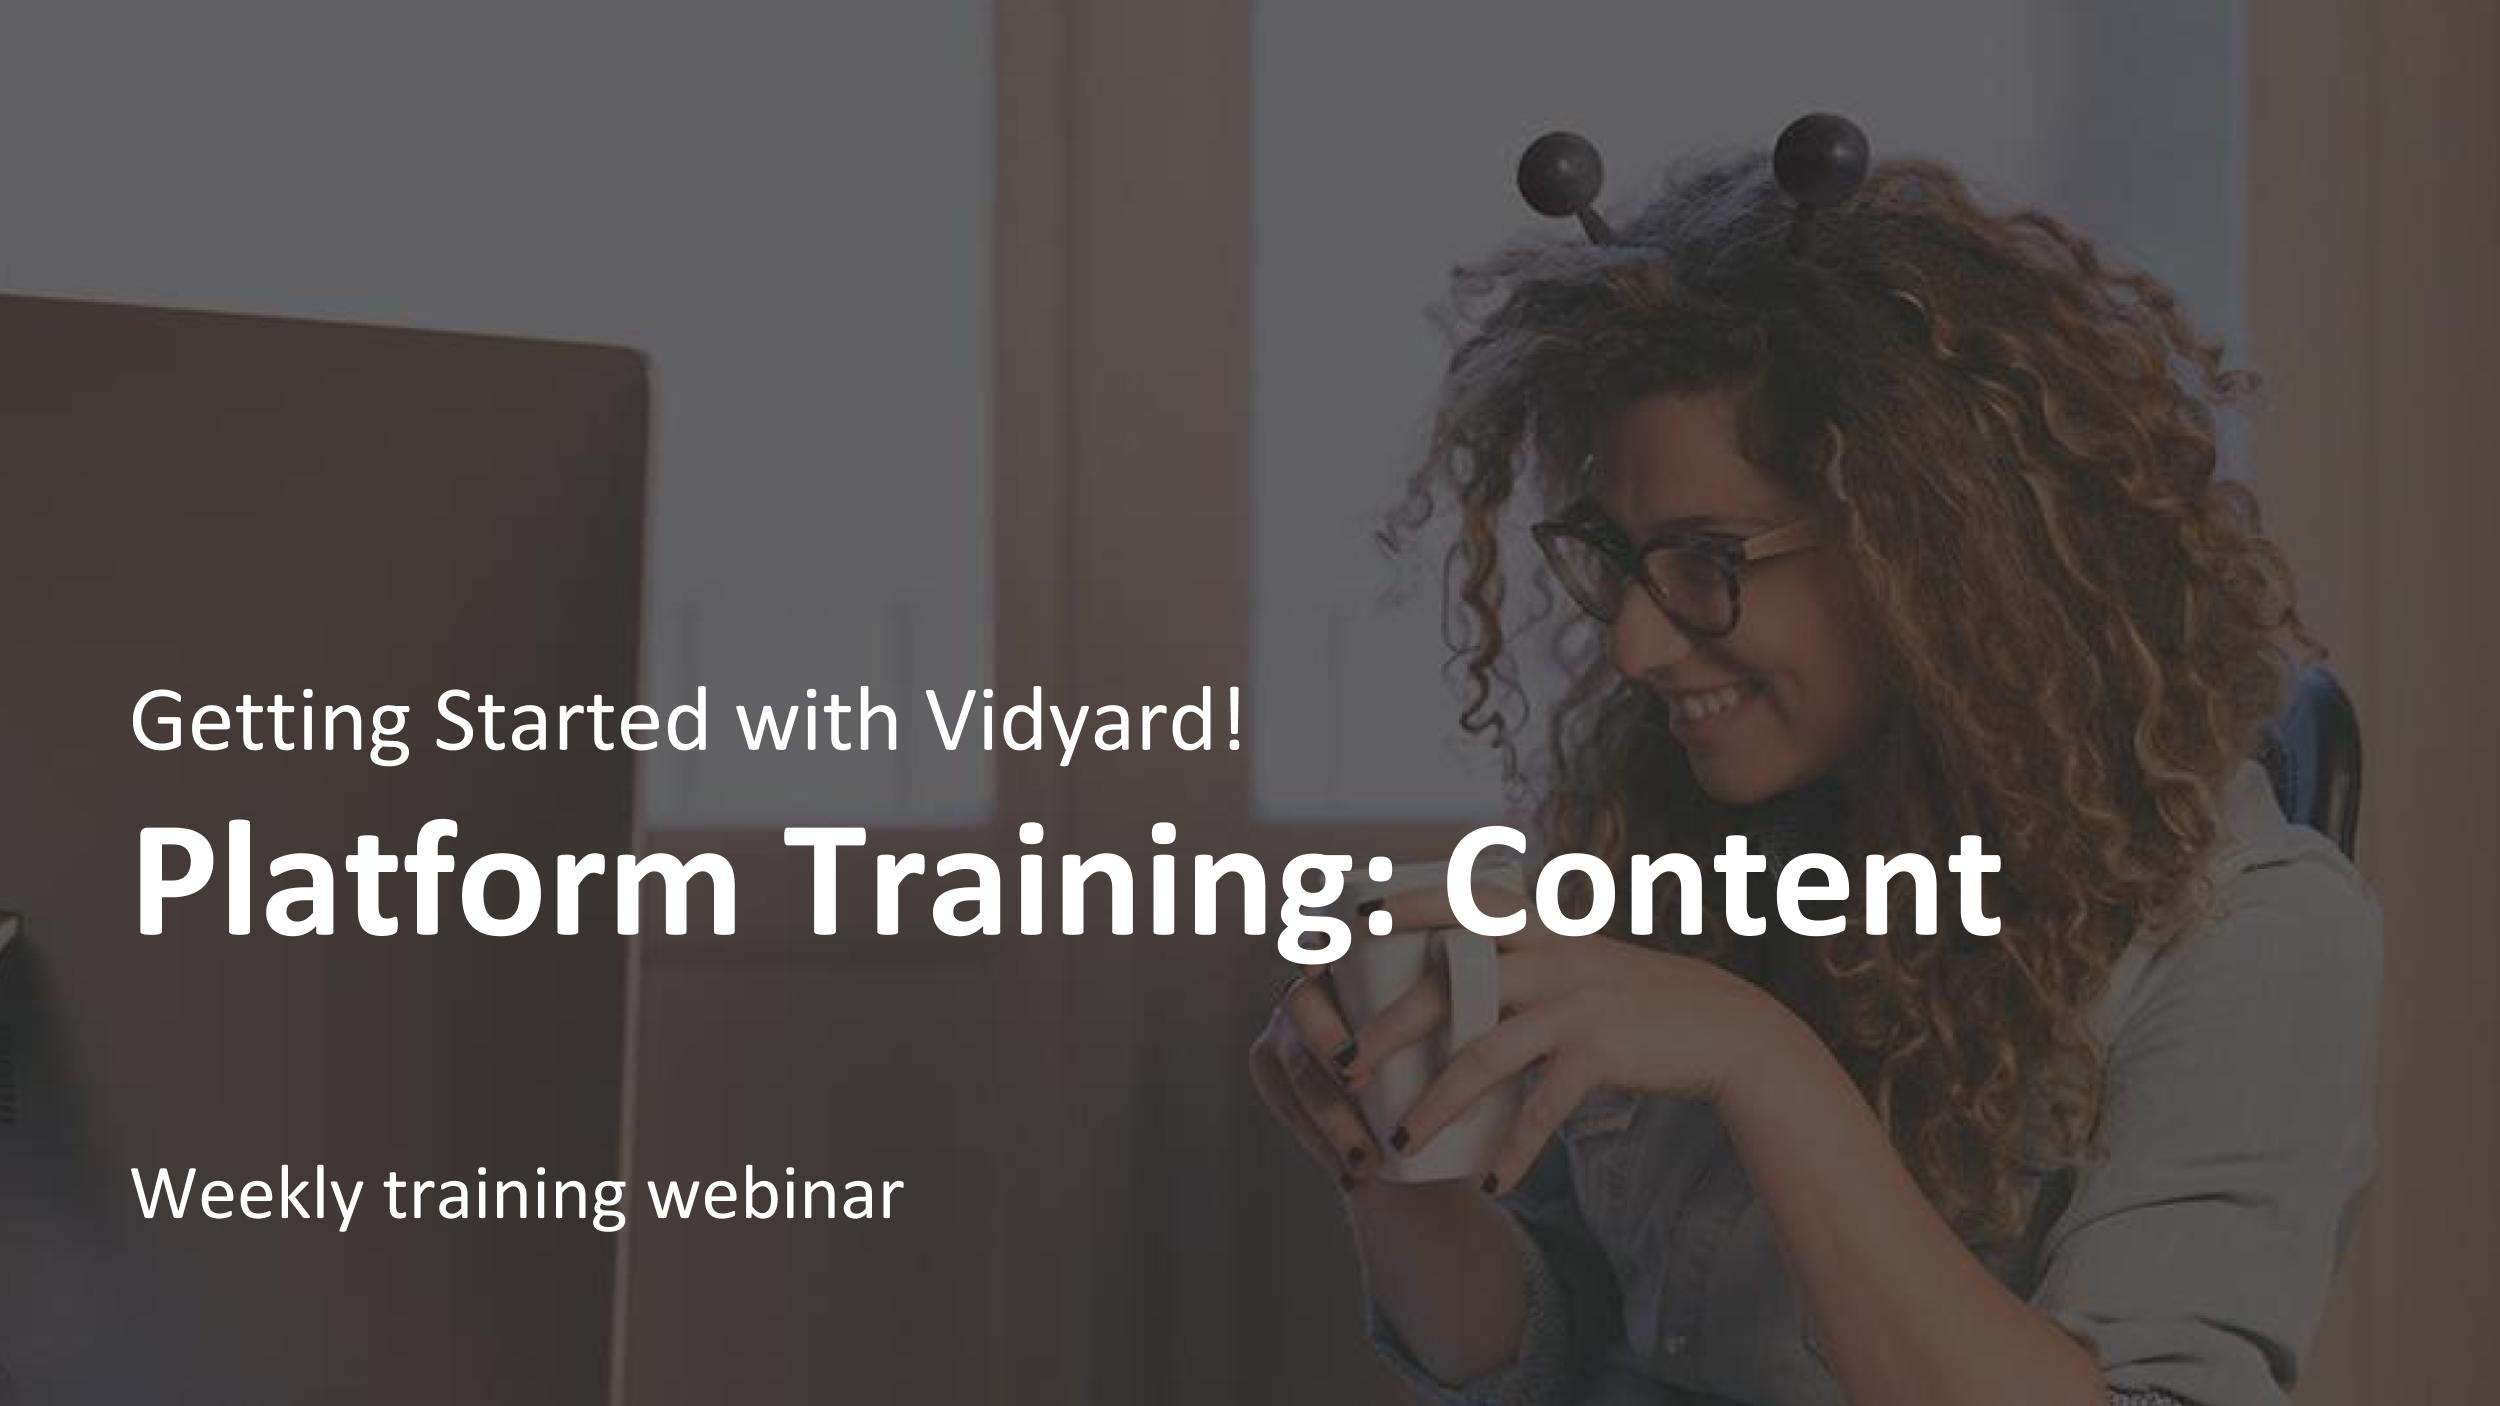 Vidyard Platform Training Webinars (2 parts)